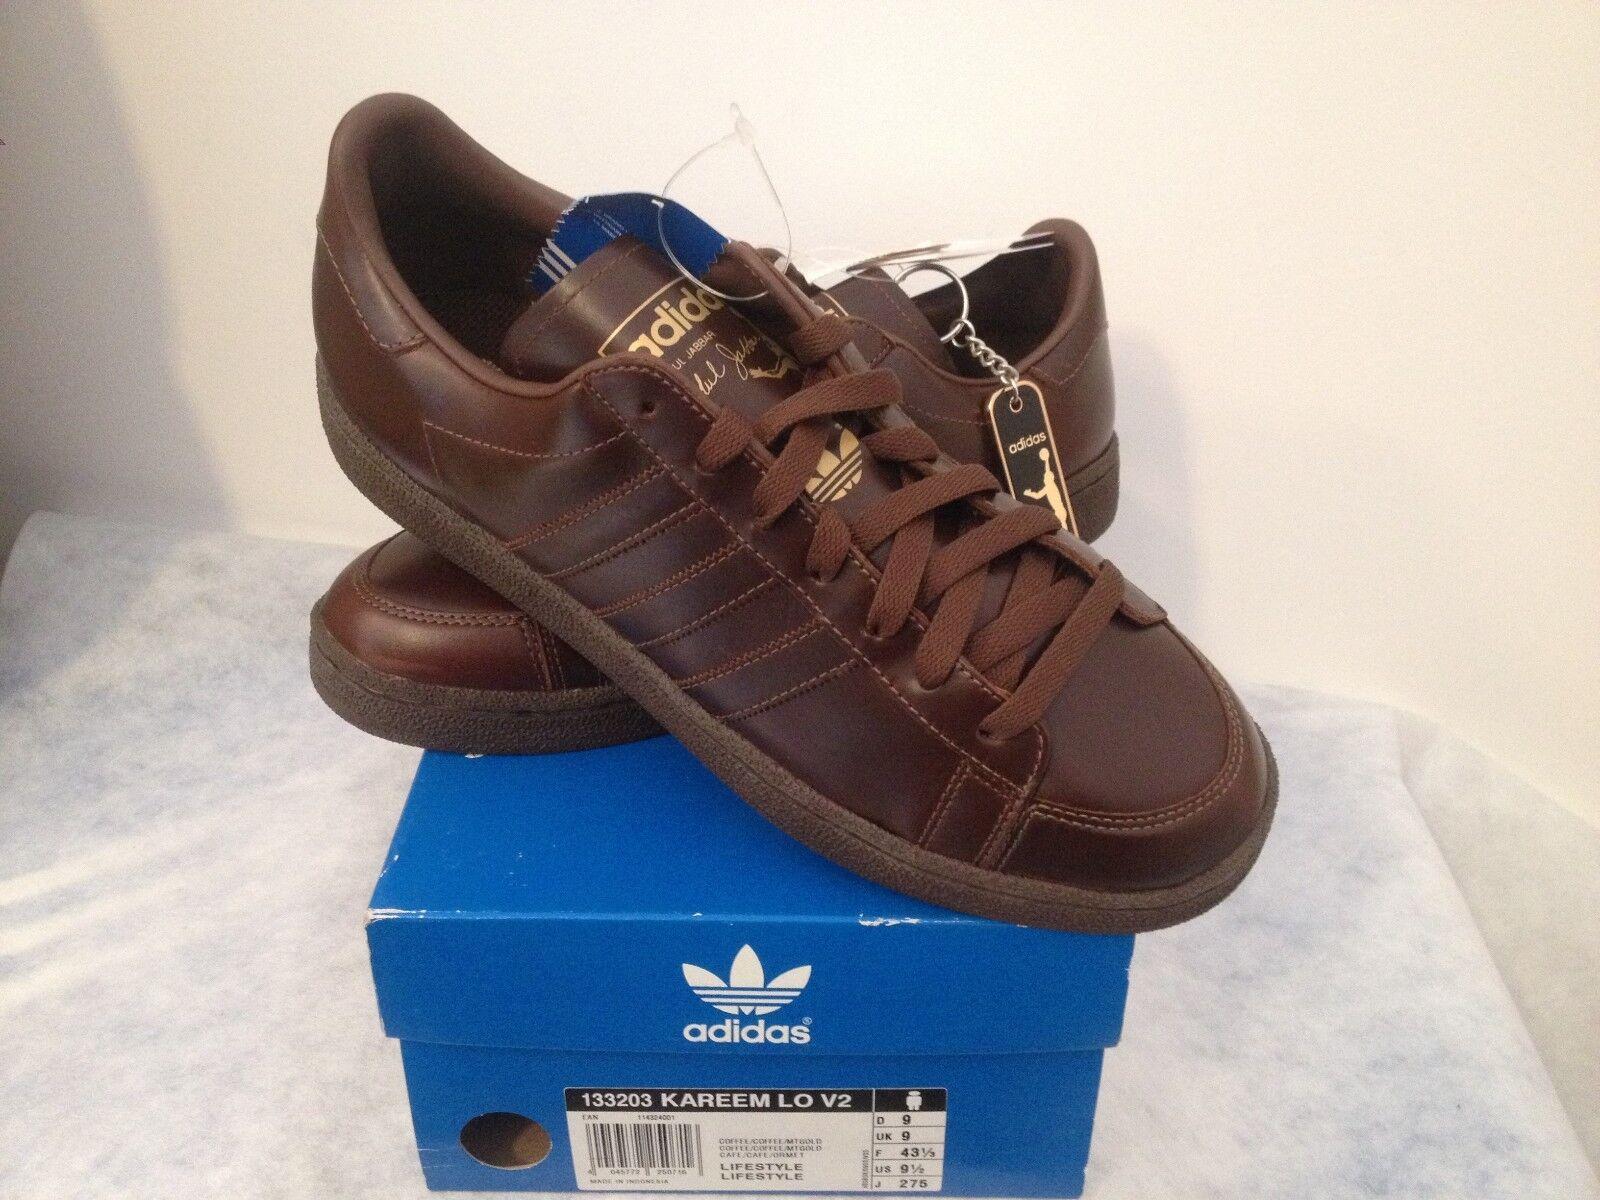 adidas Kareem in 10 44 UK 9.5 US 10 in neu BNWT Sneaker Retro Vintage Abdul Jabbar 646ebf